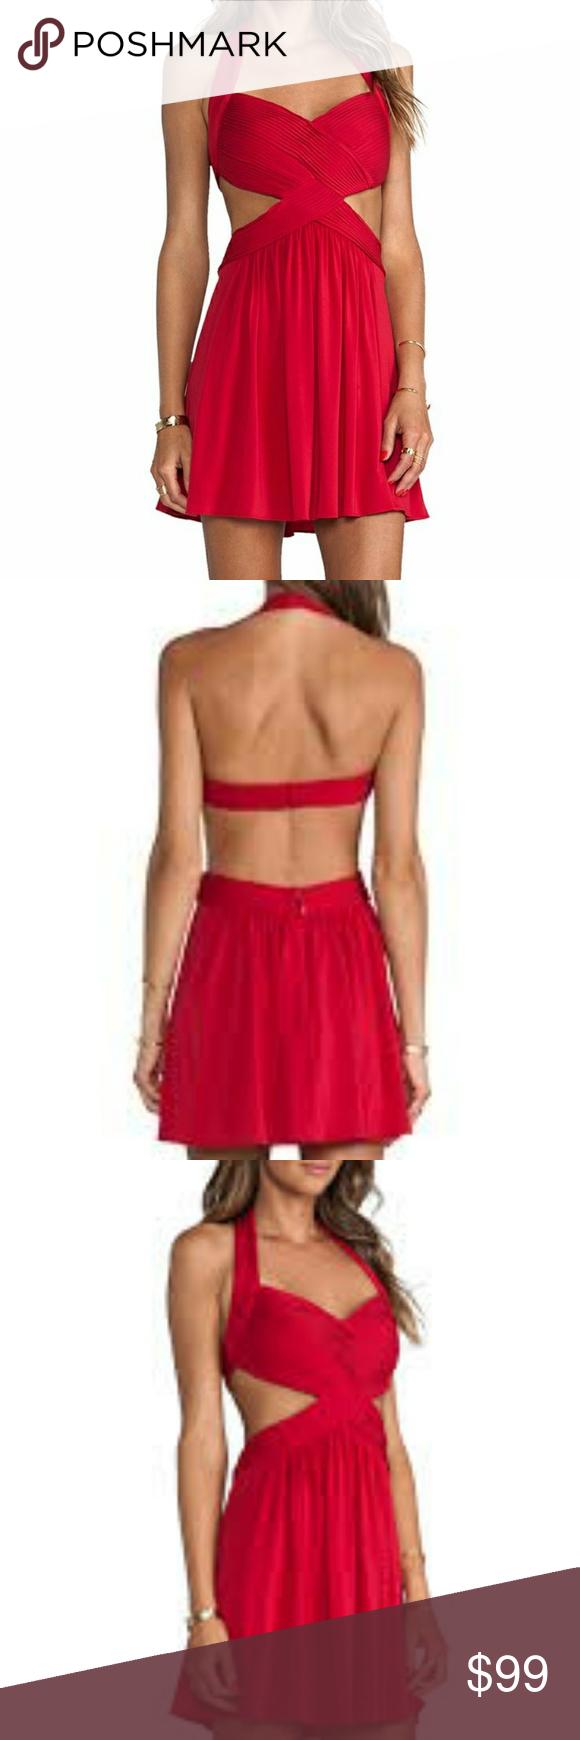 Host pick bcbg red hulter backless dress sz large boutique